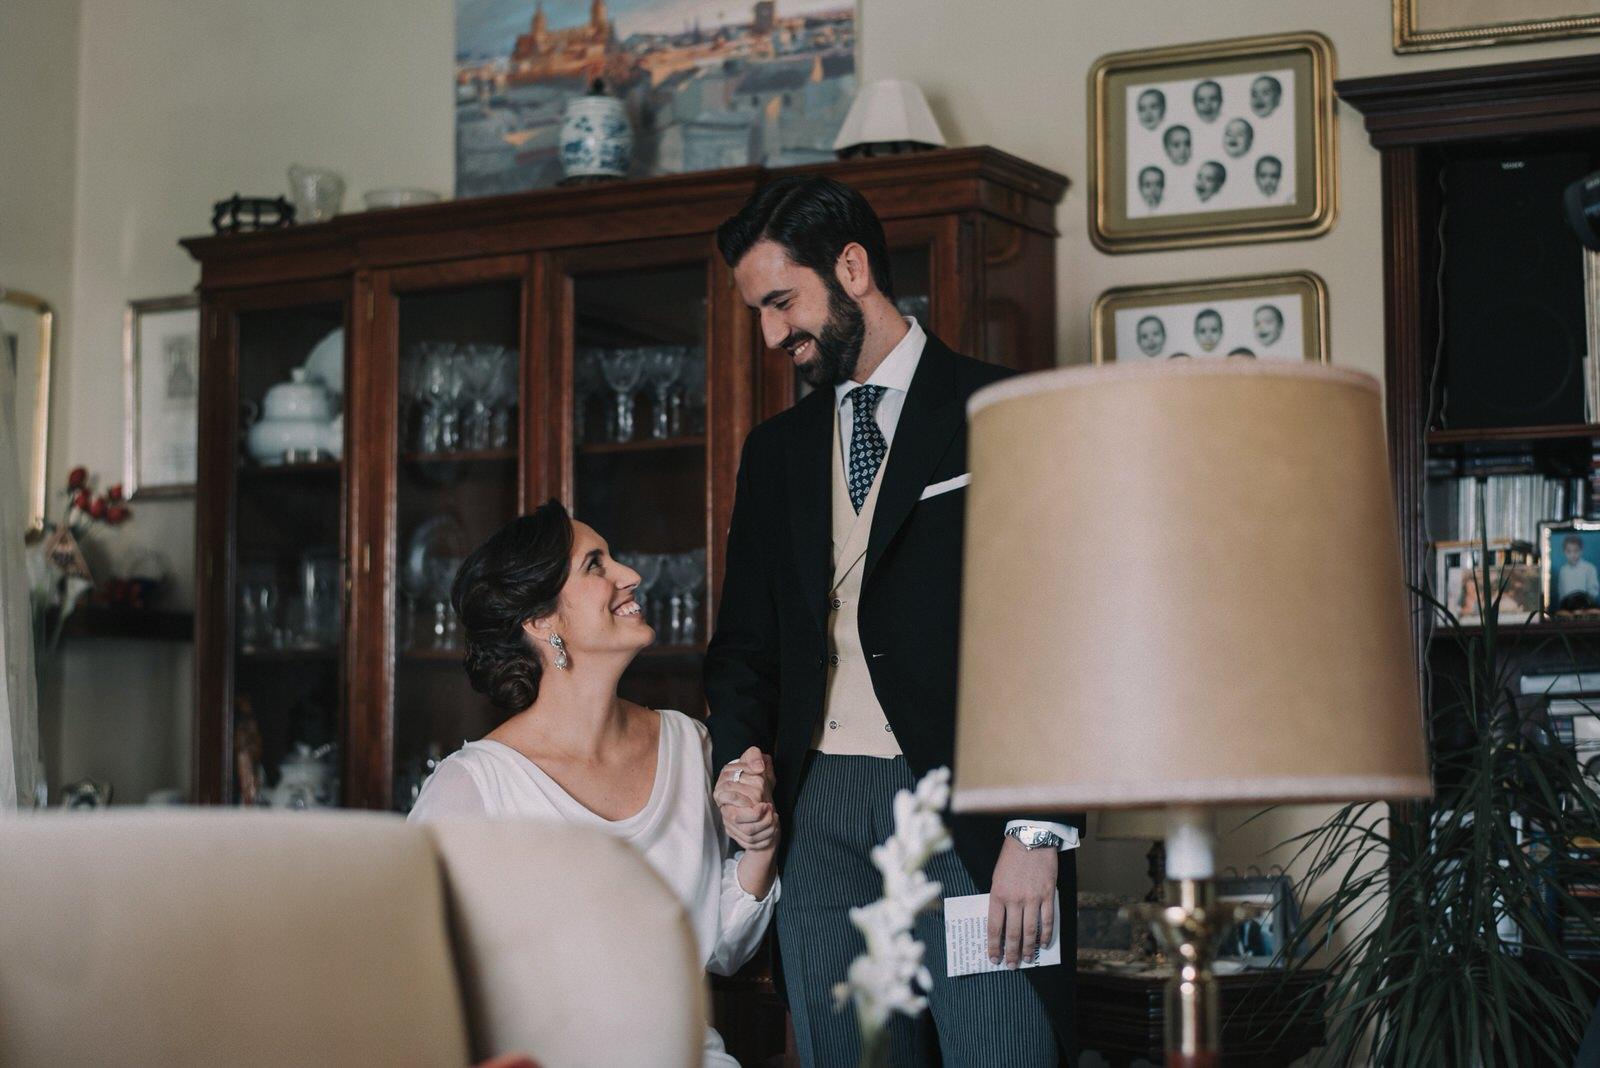 fotografo de bodas sevilla - fotografo boda - fotografía sevilla - Andrés AmarilloAAA_4402- tele- fine.JPG